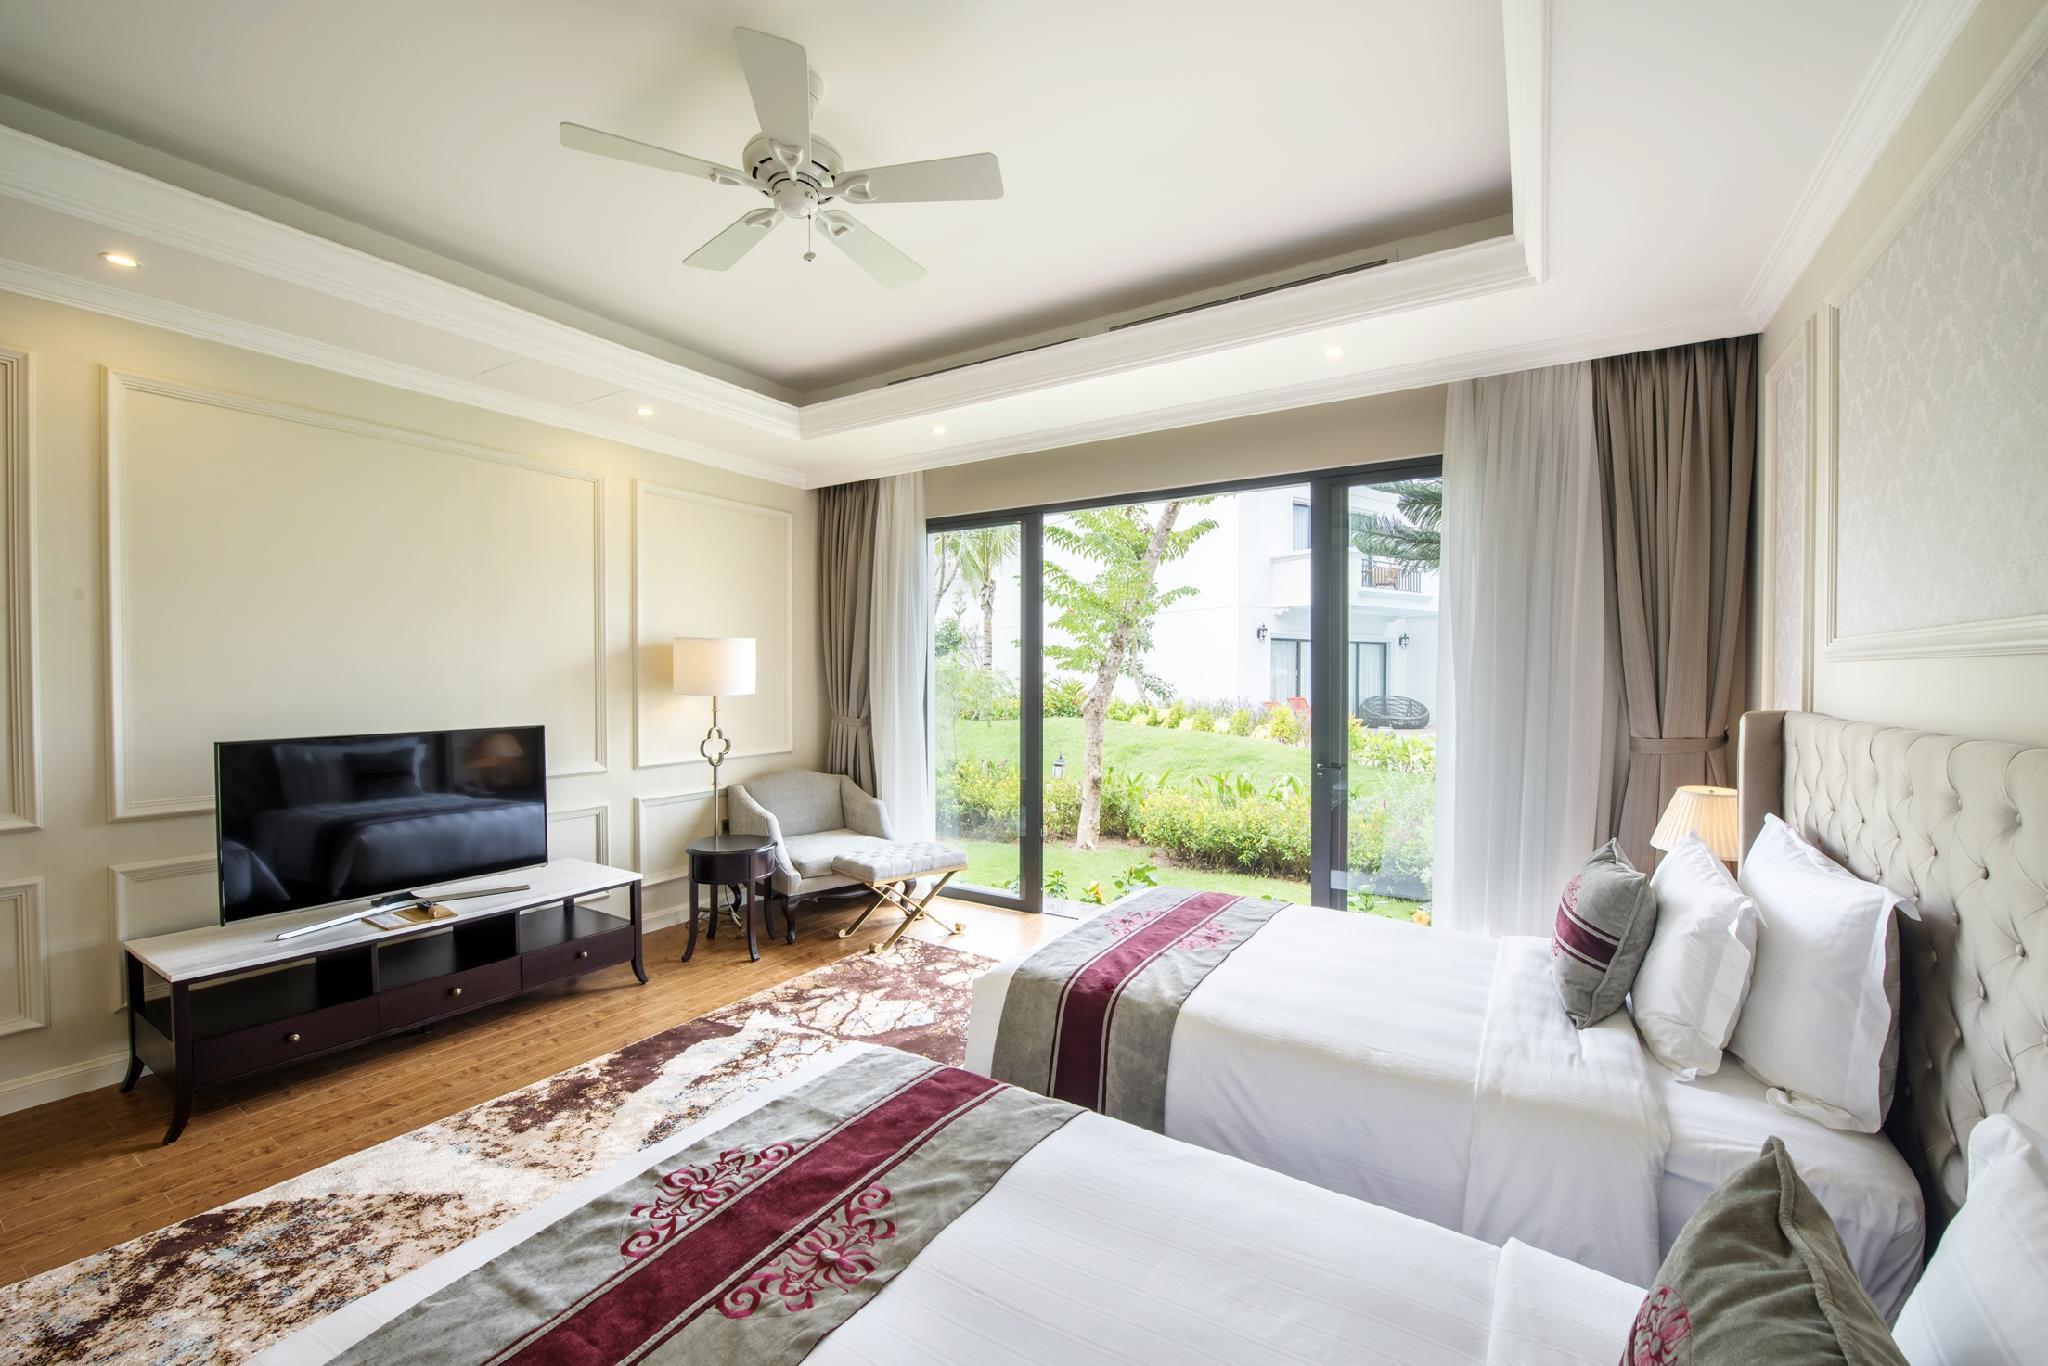 Vinpearl Resort Golf Phu Quoc Ganh Dau Phu Quoc Island